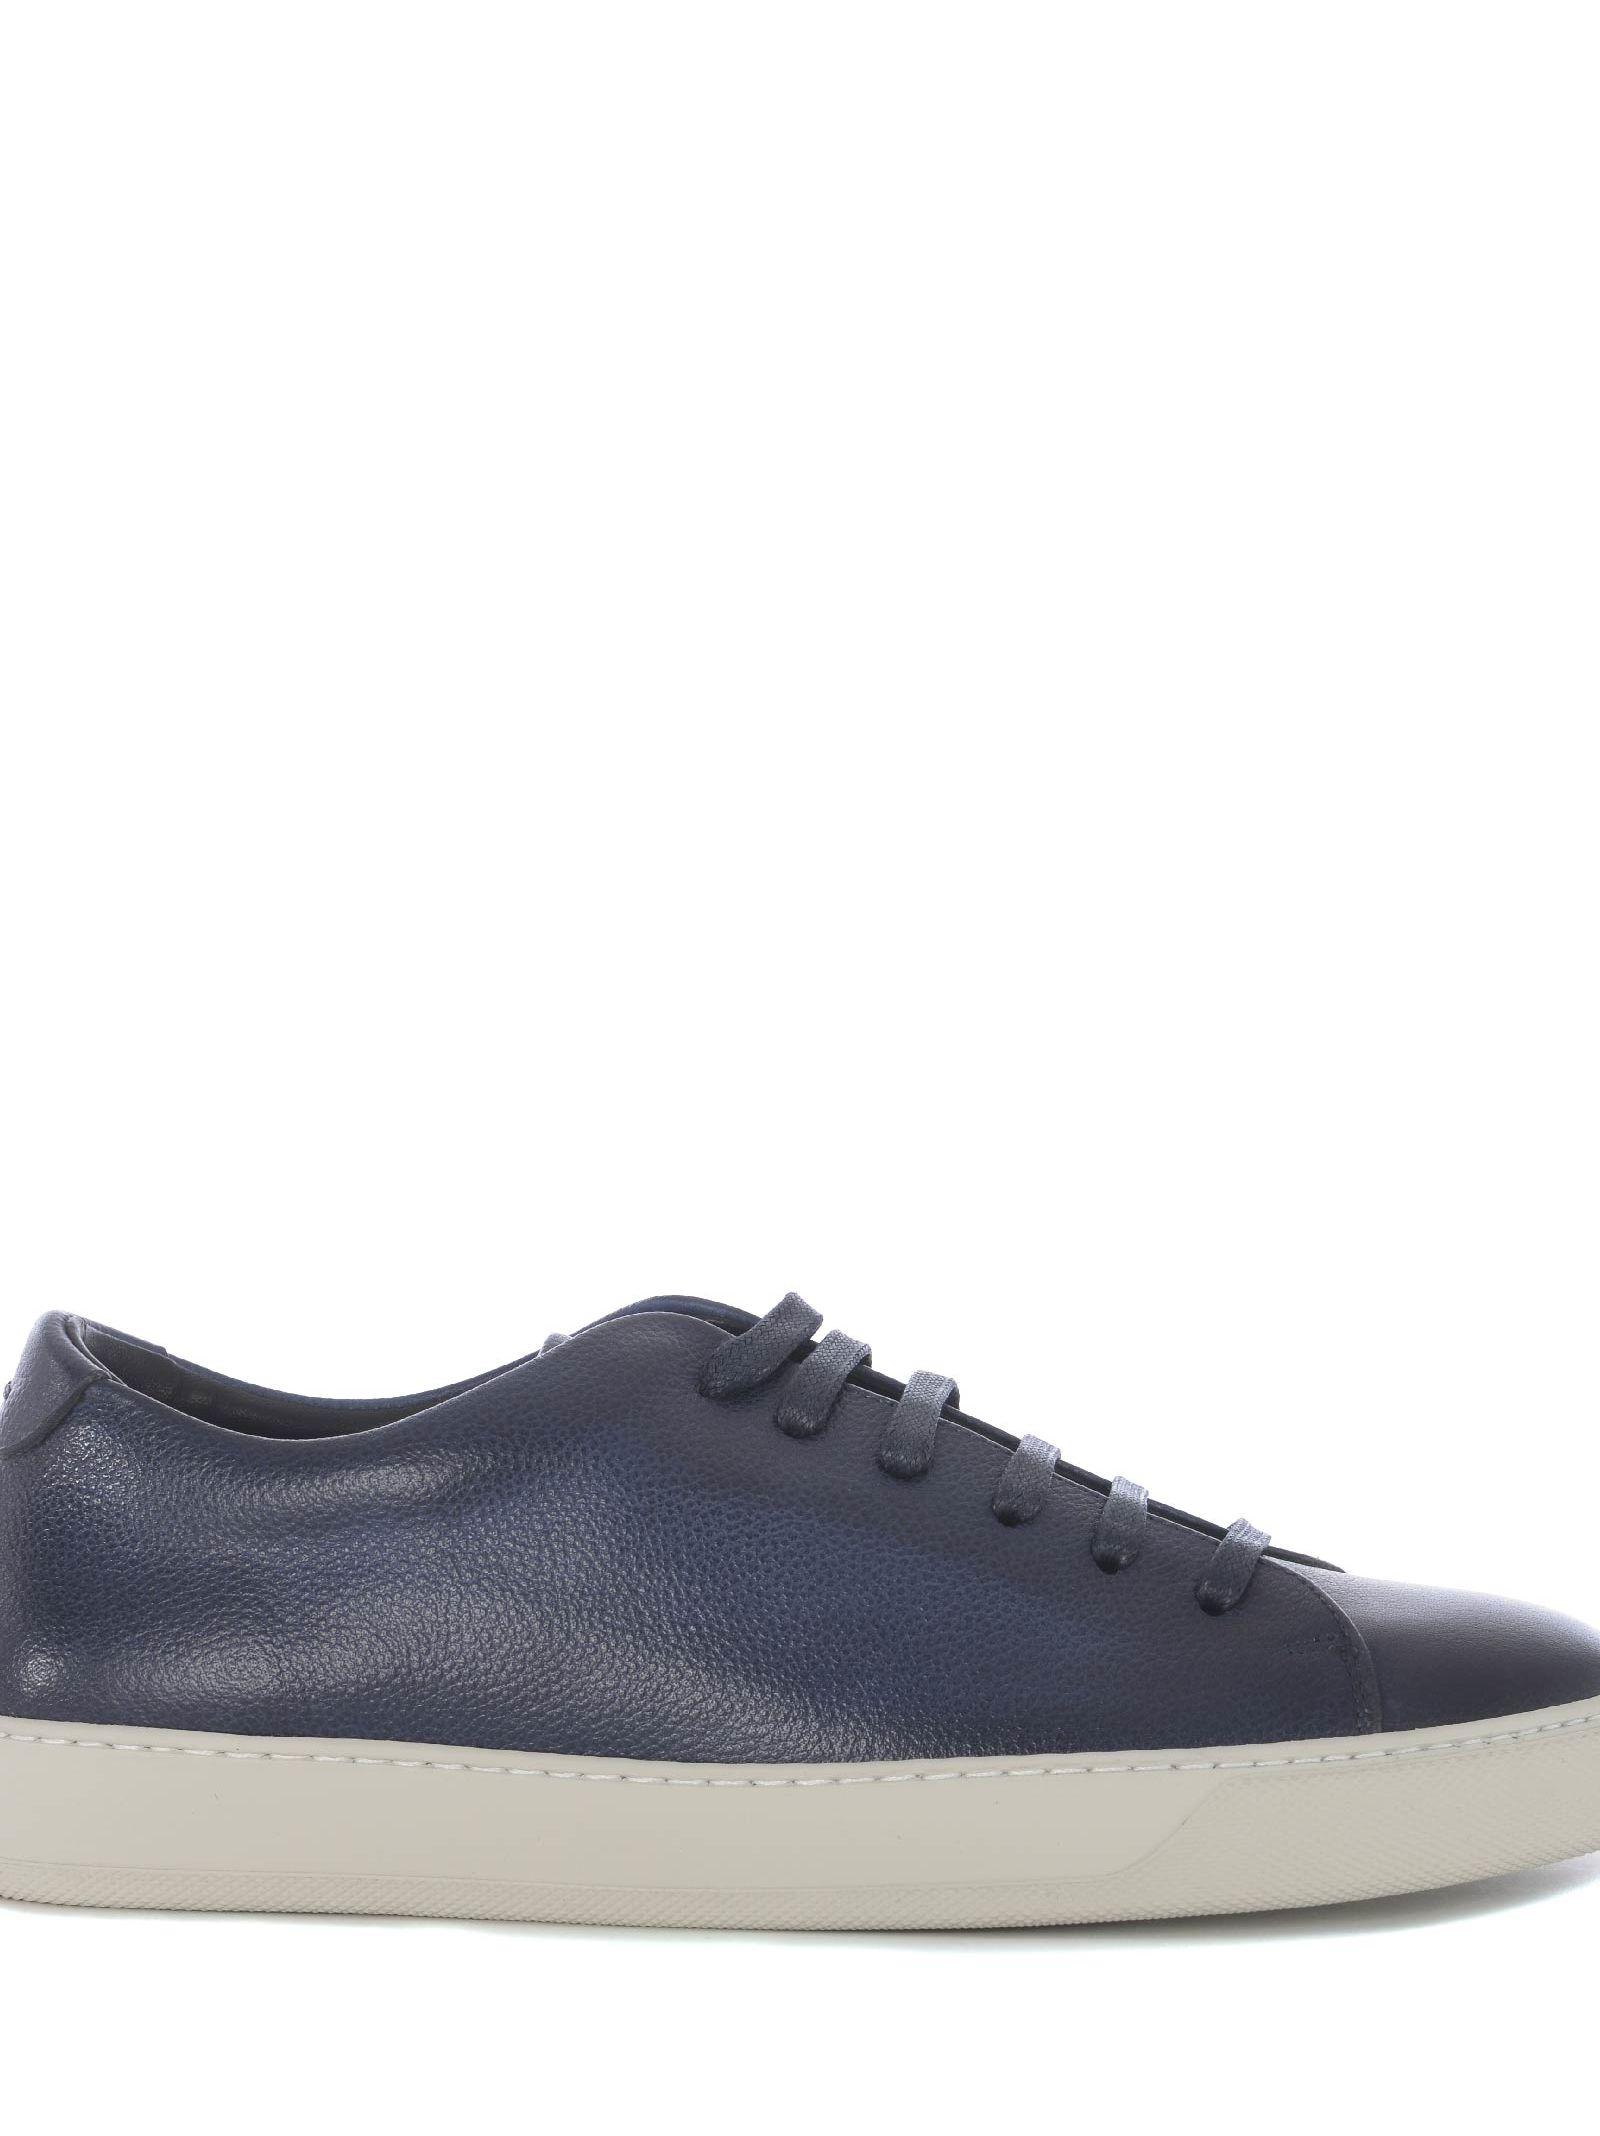 ANDREA ZORI Low-Top Sneakers in Blu Scuro